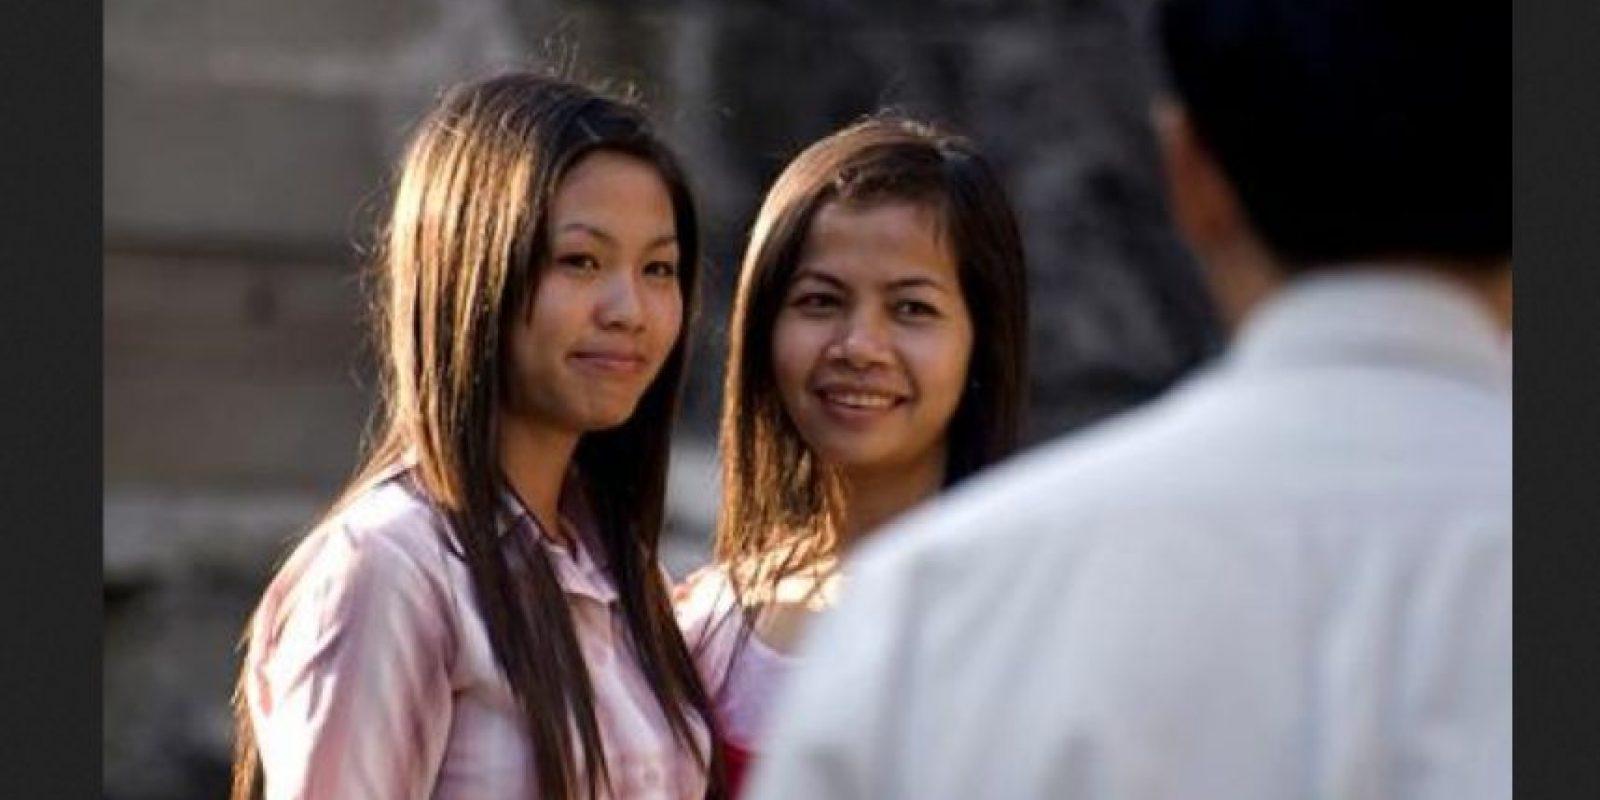 4. Filipinas con 47.6% Foto:Smortfront